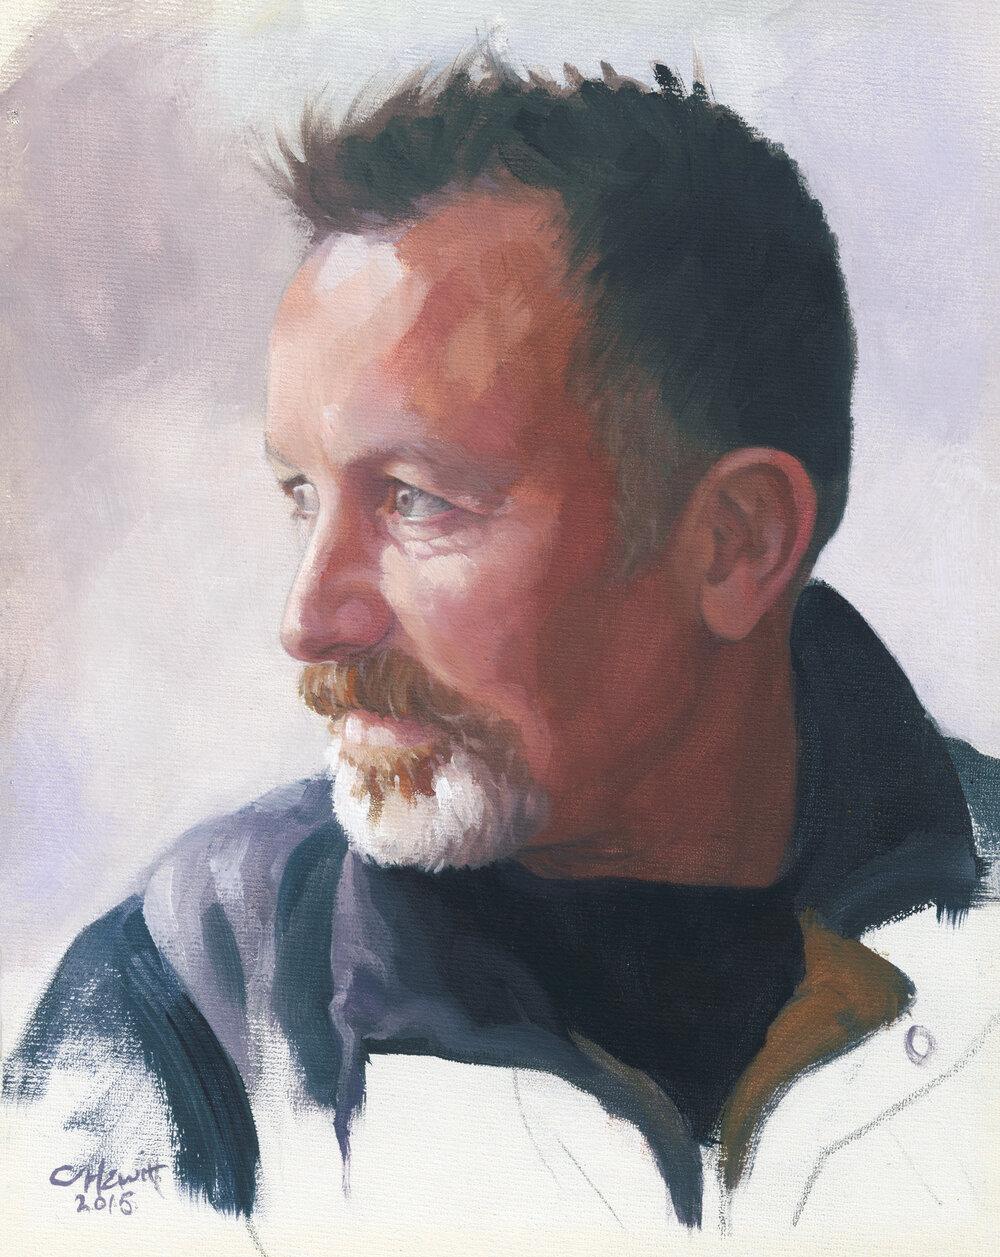 'Ian', oil on canvas board, 29x25cm. Exhibited at the Scottish Portrait Awards at the Scottish Arts Club, Edinburgh.